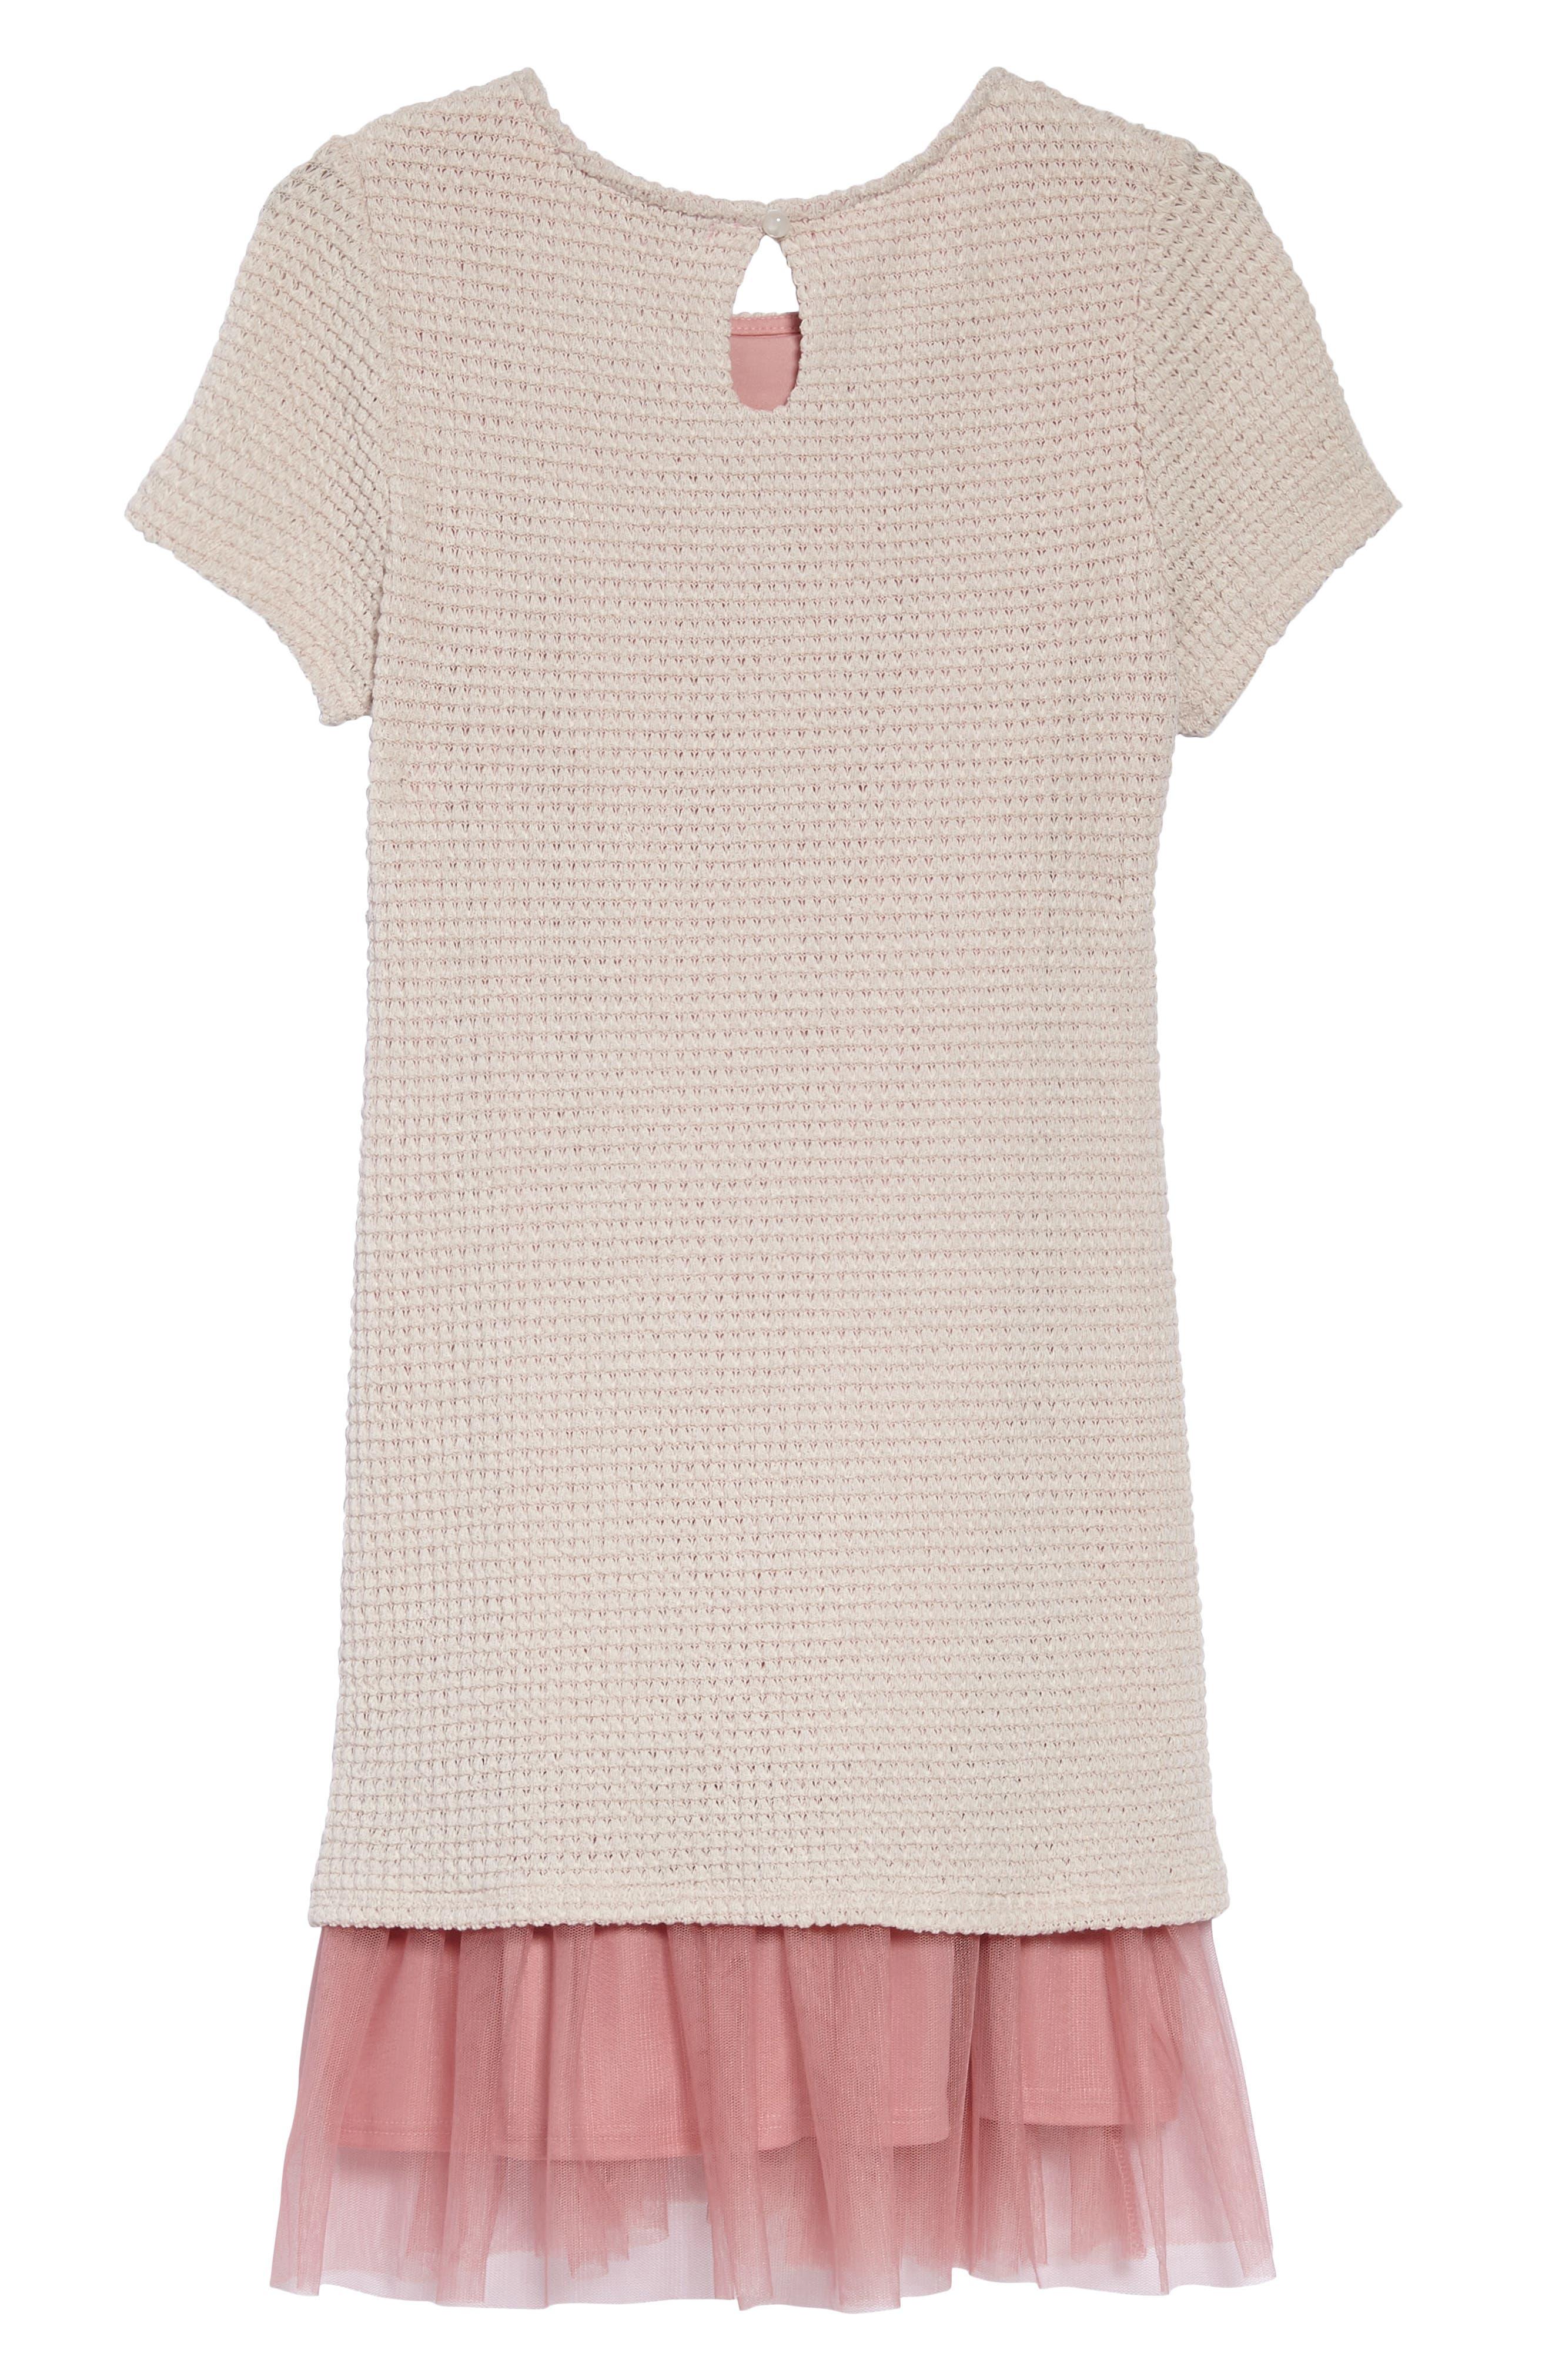 Sweater Knit Tulle Dress,                             Alternate thumbnail 2, color,